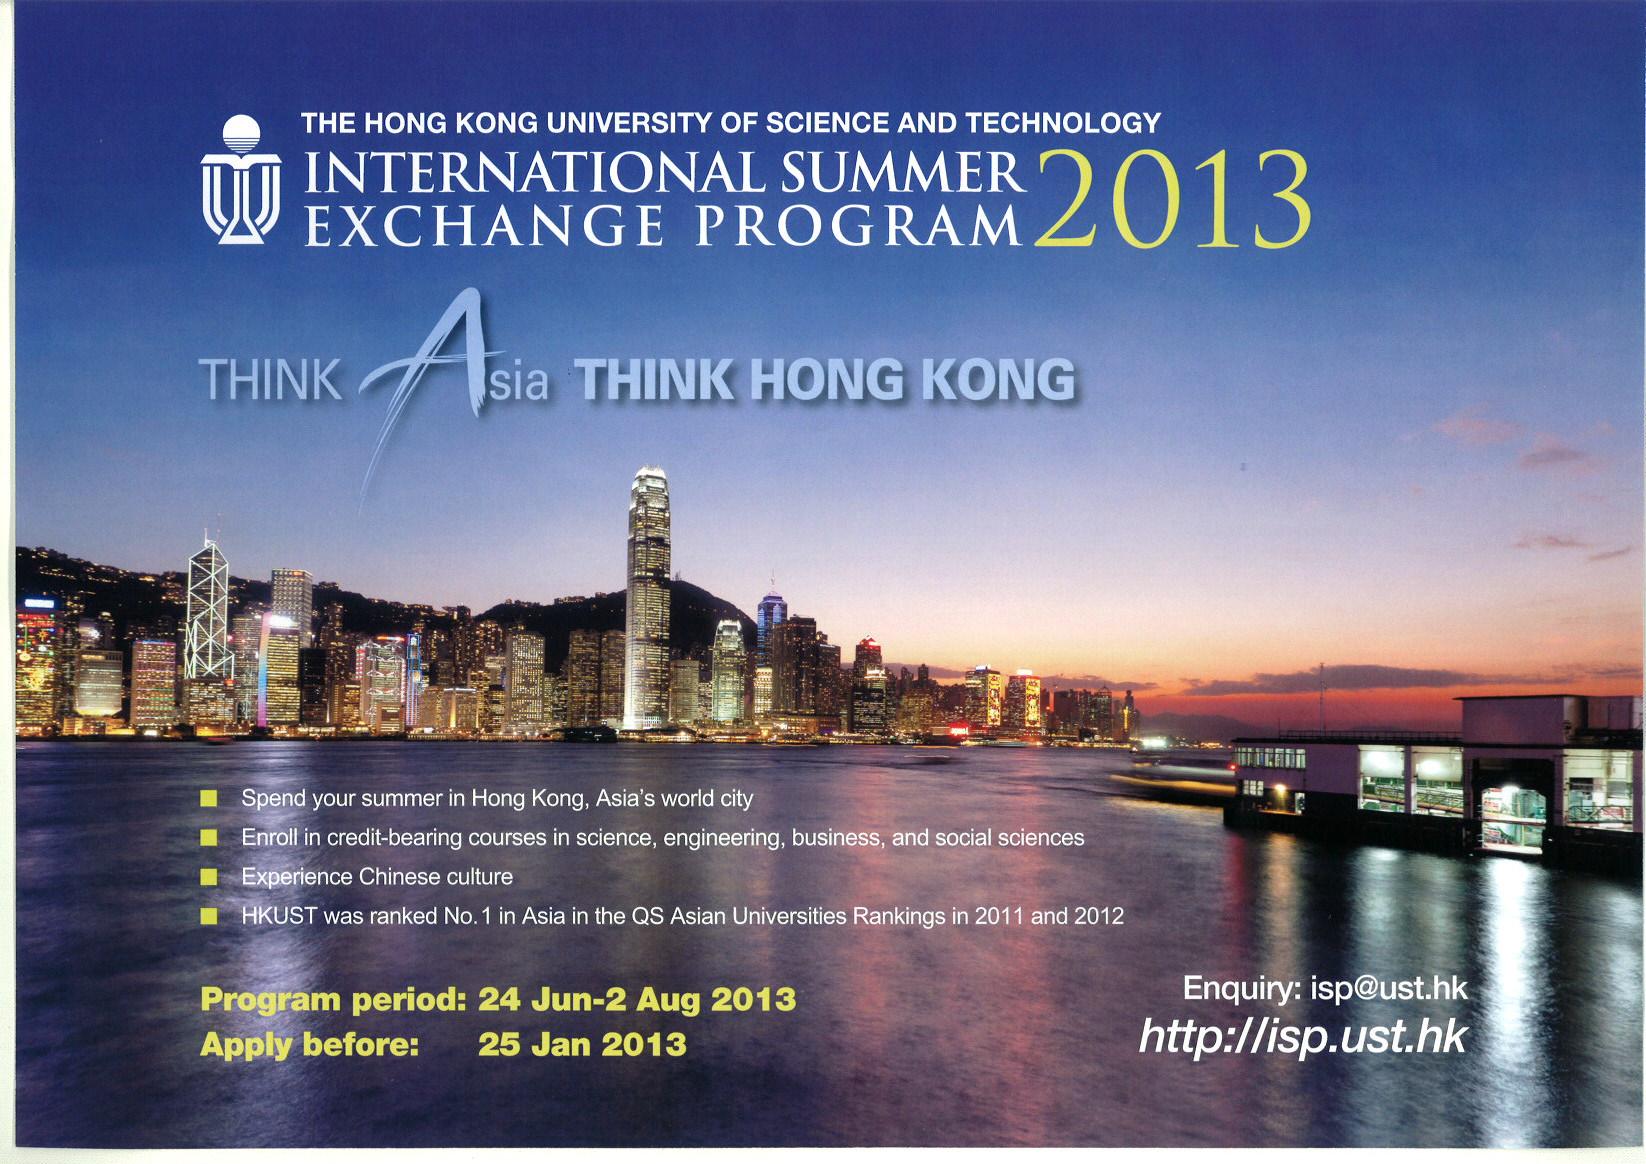 hong kong university of science and technology hkust. Black Bedroom Furniture Sets. Home Design Ideas